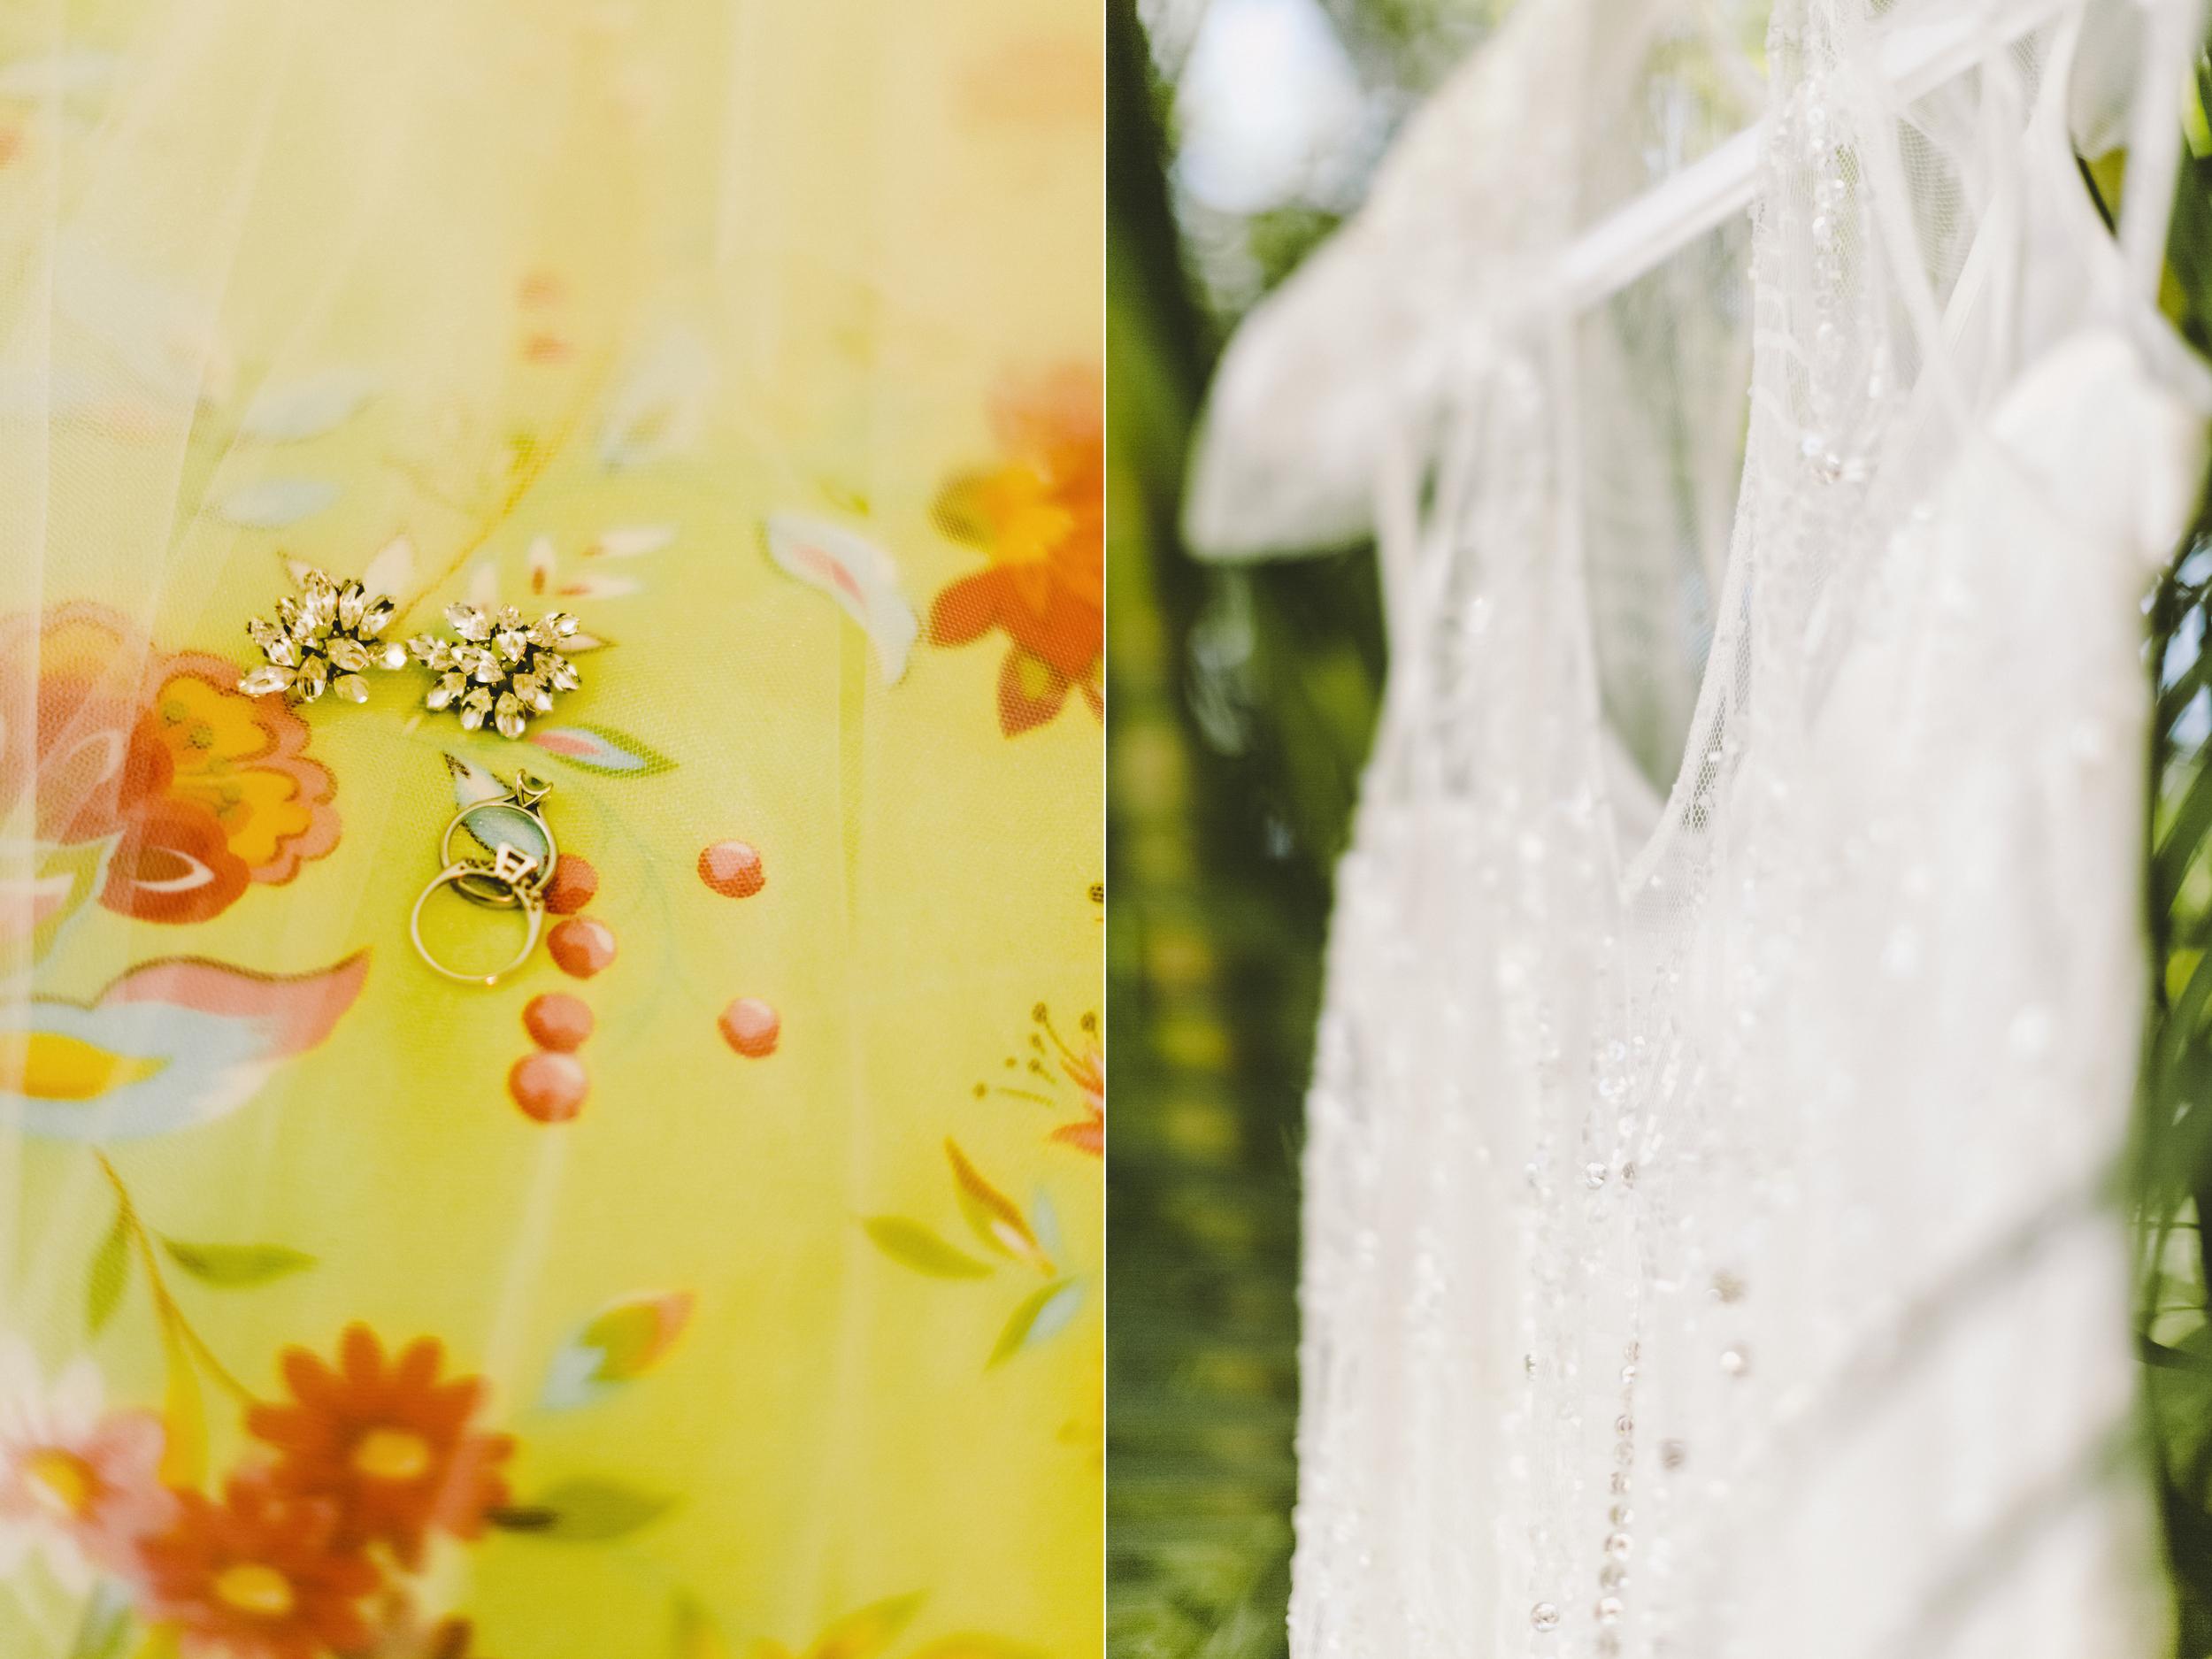 angie-diaz-photography-maui-wedding-mel-matt-04.jpg